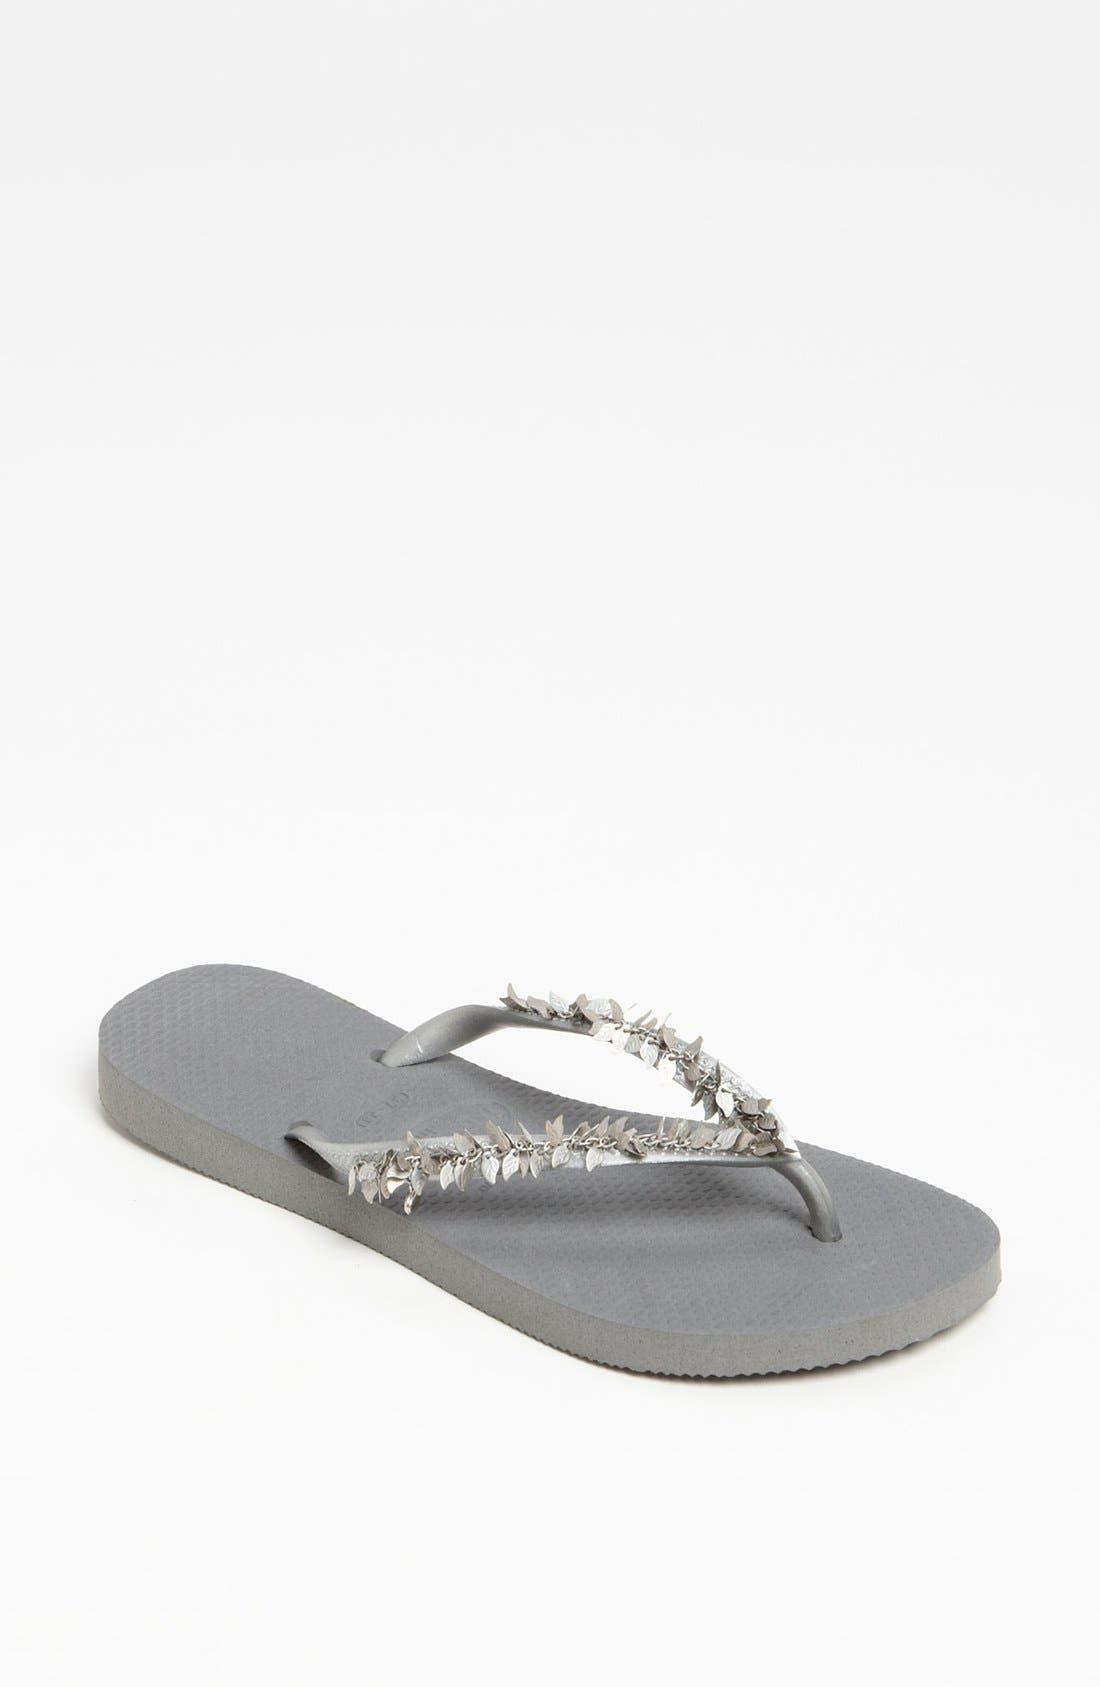 Main Image - Havaianas 'Slim Leaves' Sandal (Women)